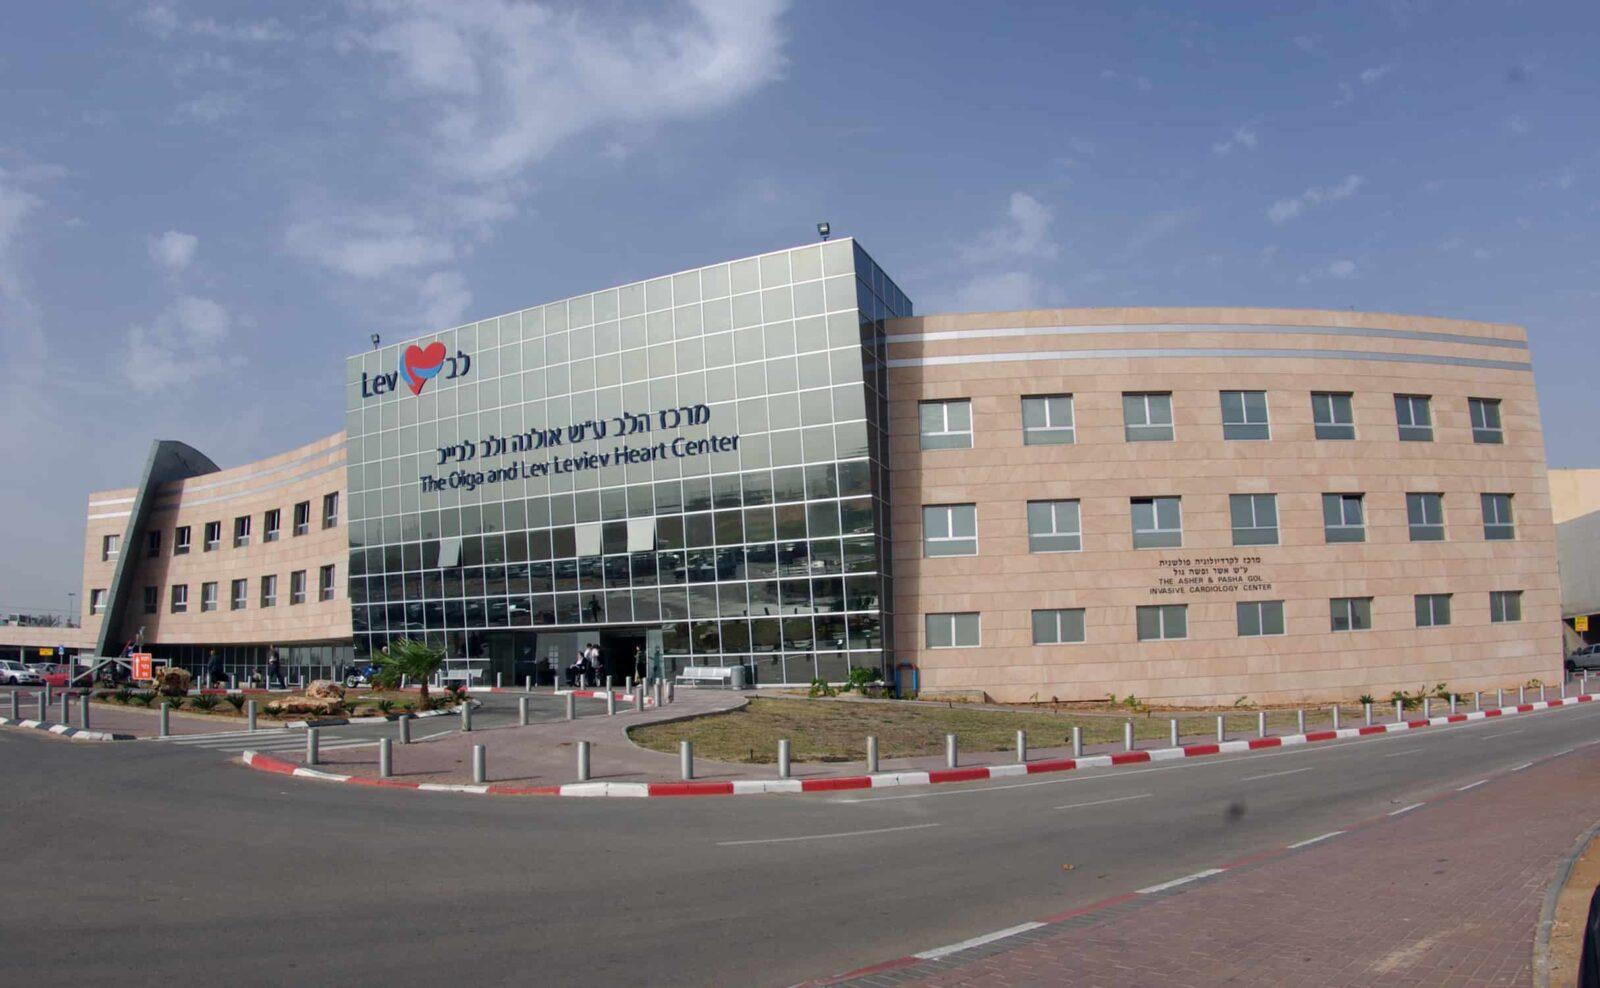 Медицинский центр Хаима Шибы (клиника Шиба)